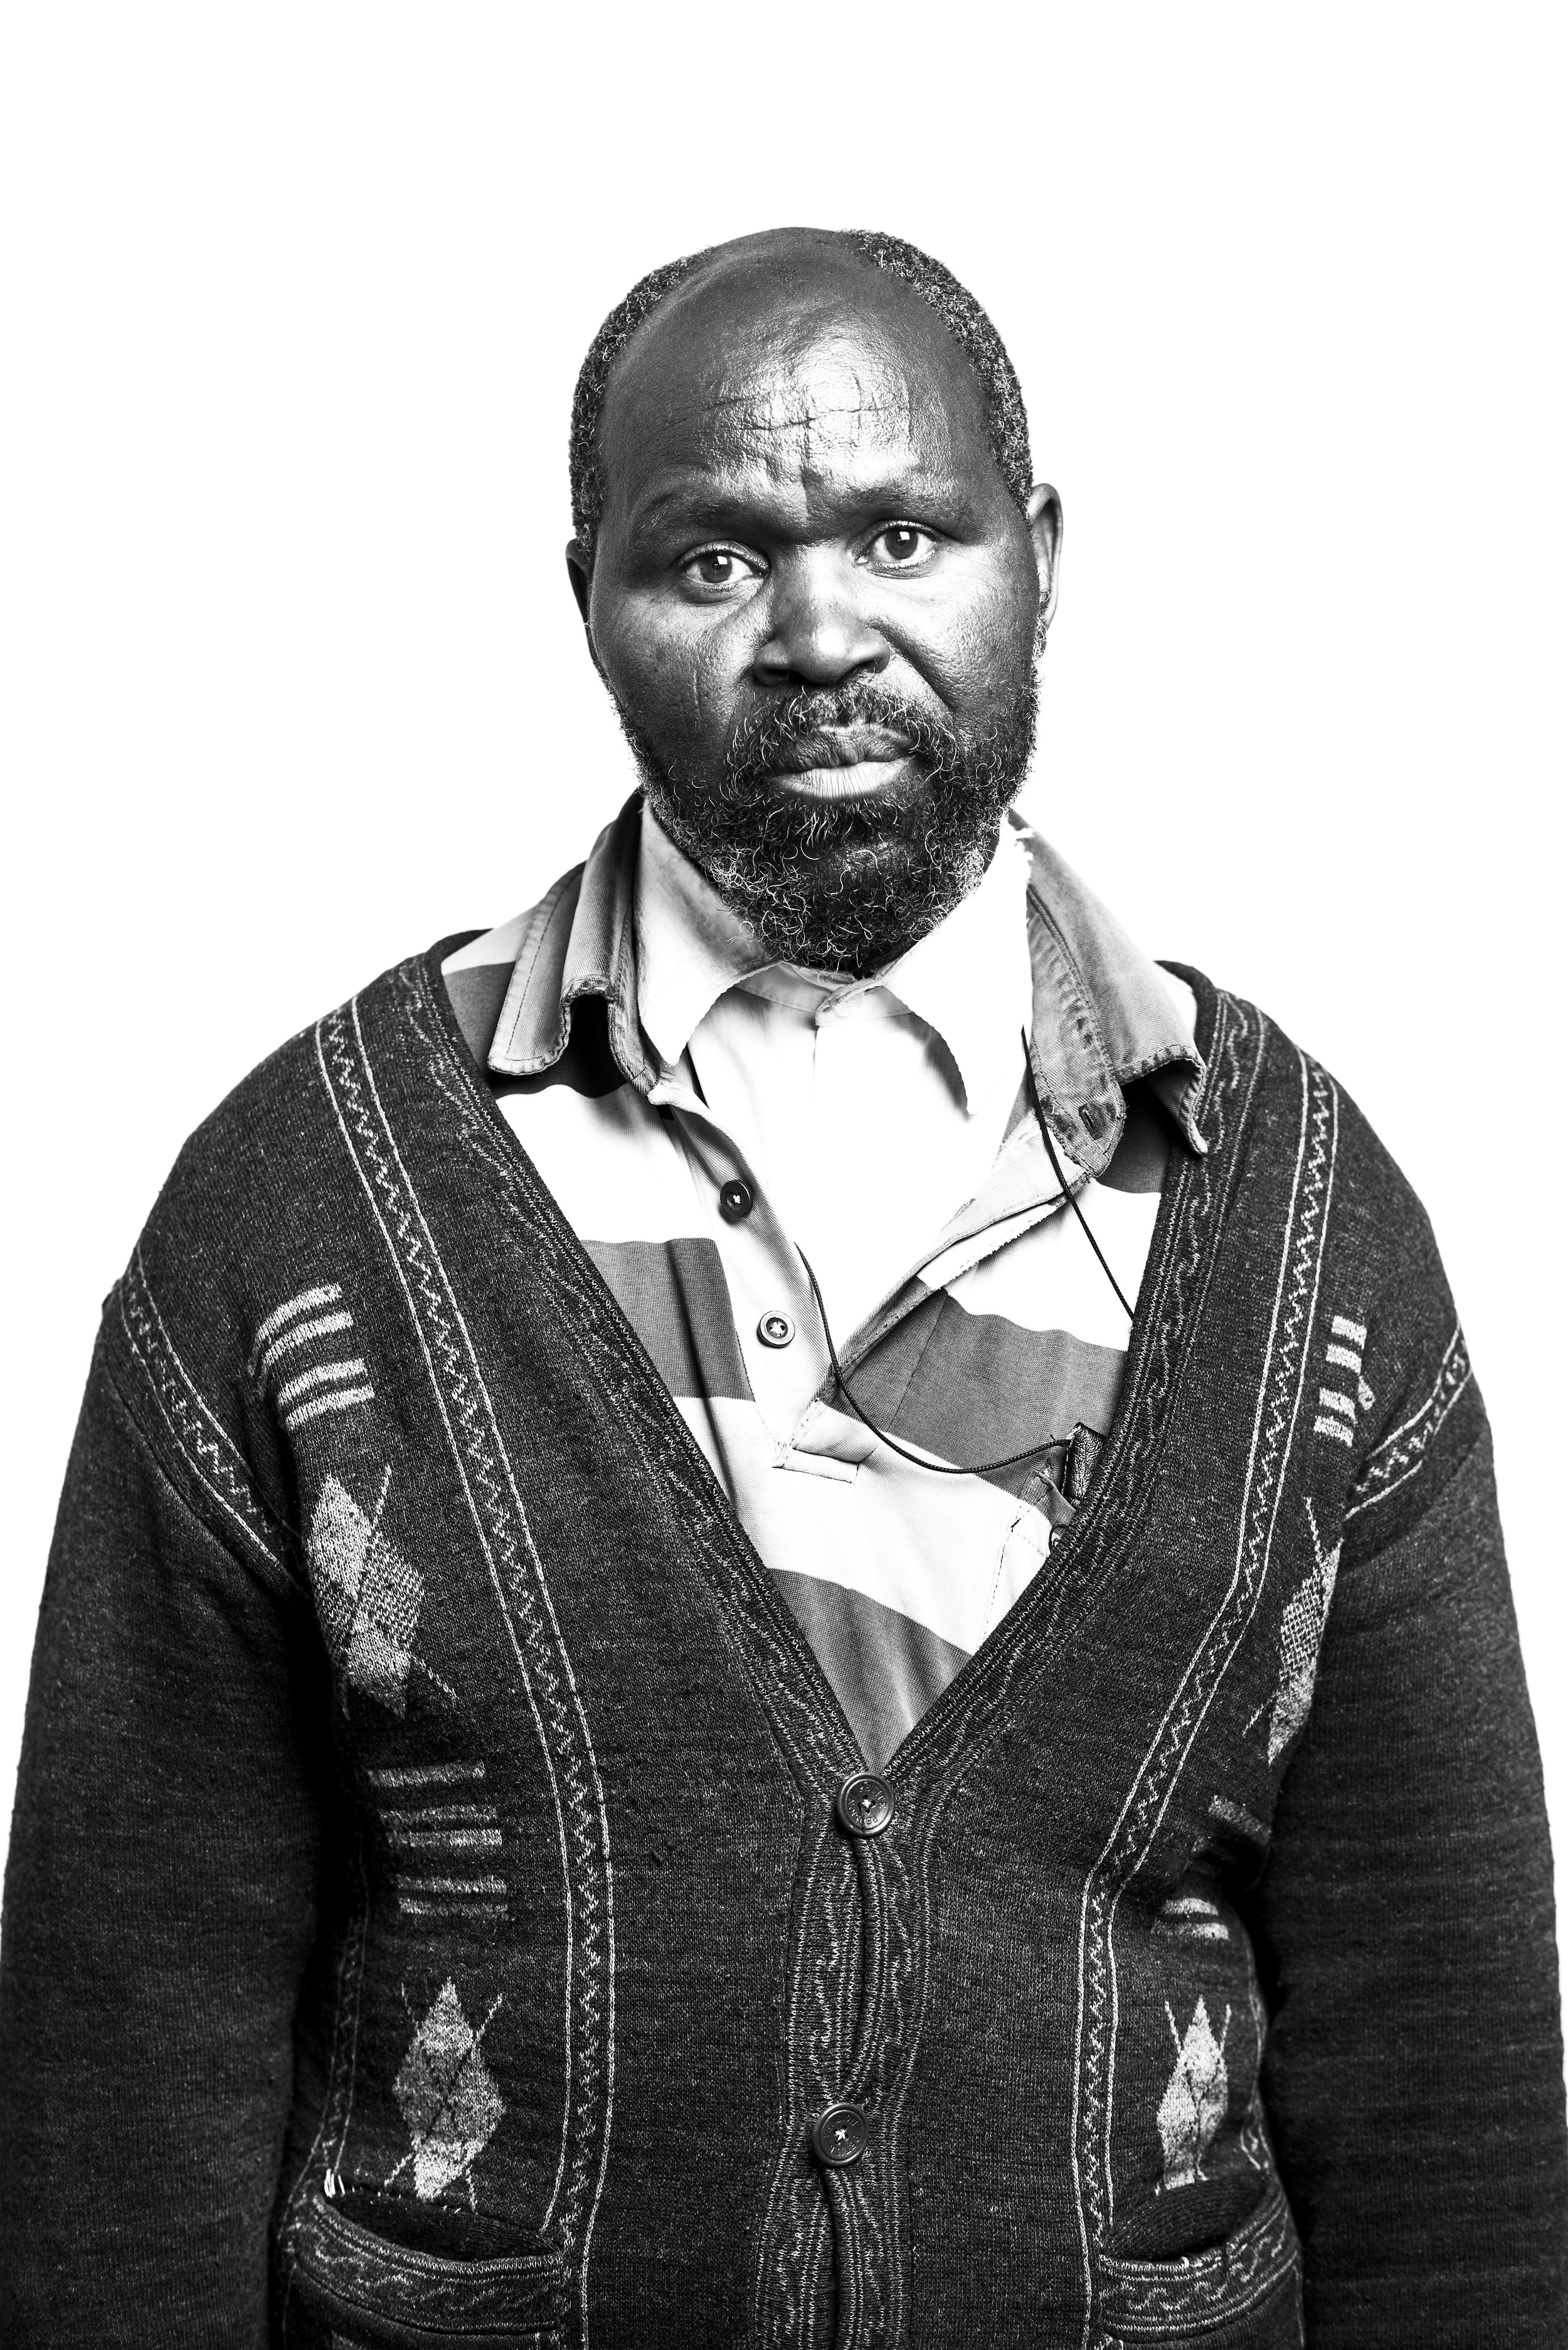 Mthuthuzeli Mtshange